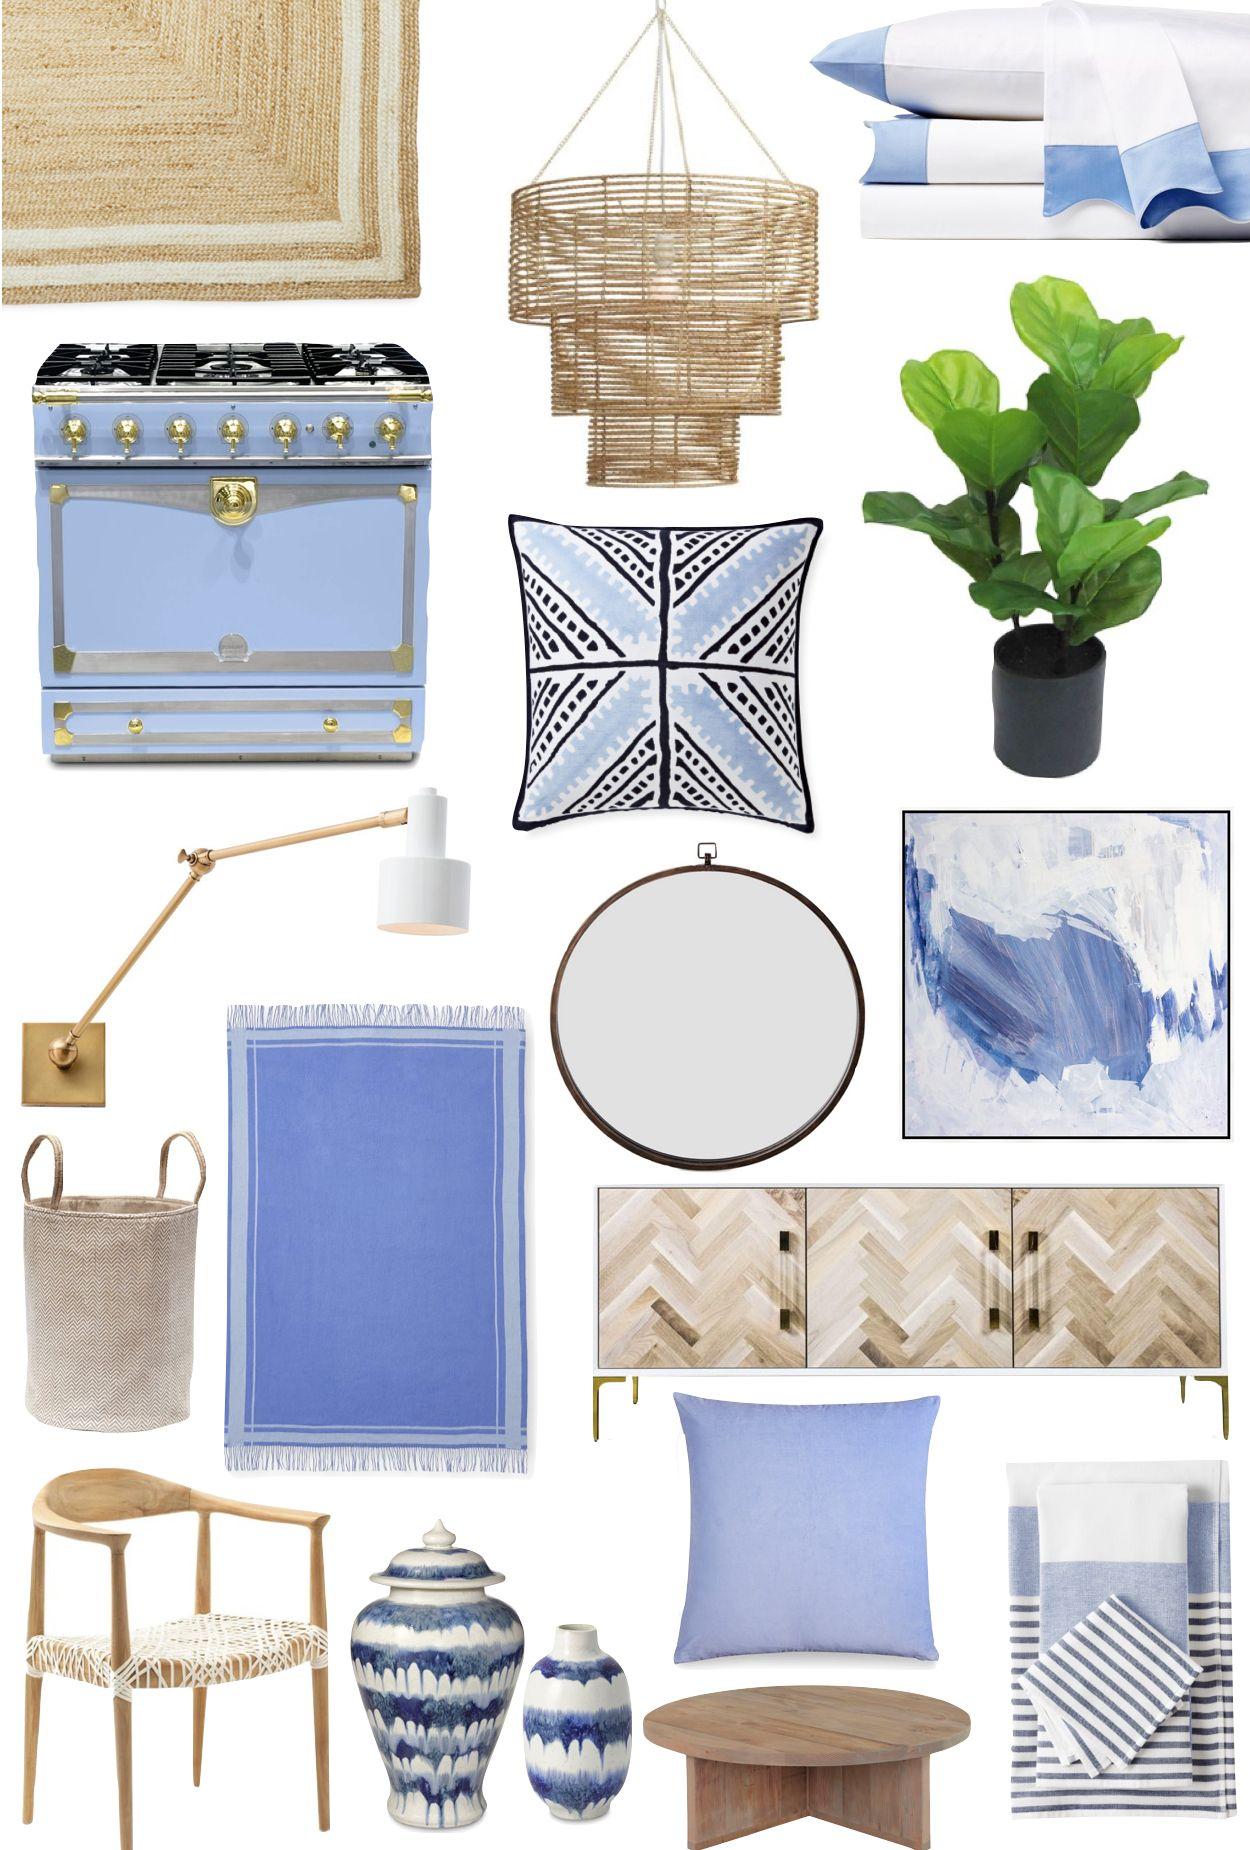 Laid back kikius list kikius list beautiful furniture in